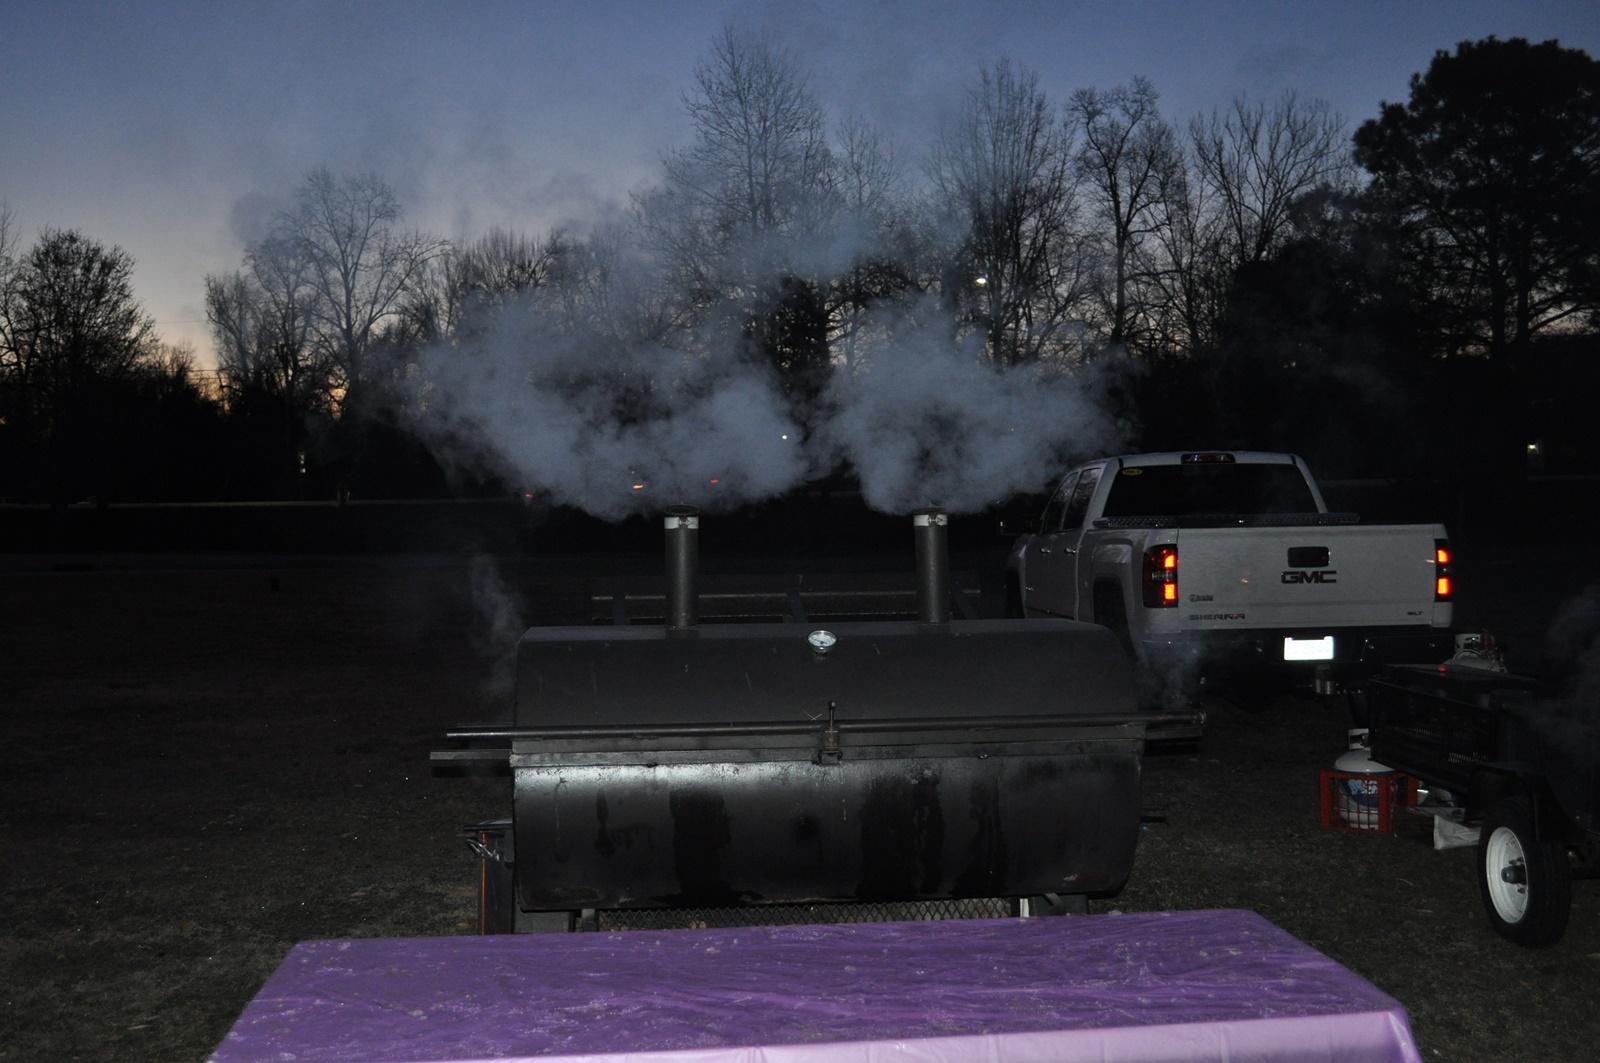 2017-0316 BBQ - Smoking Grill.JPG